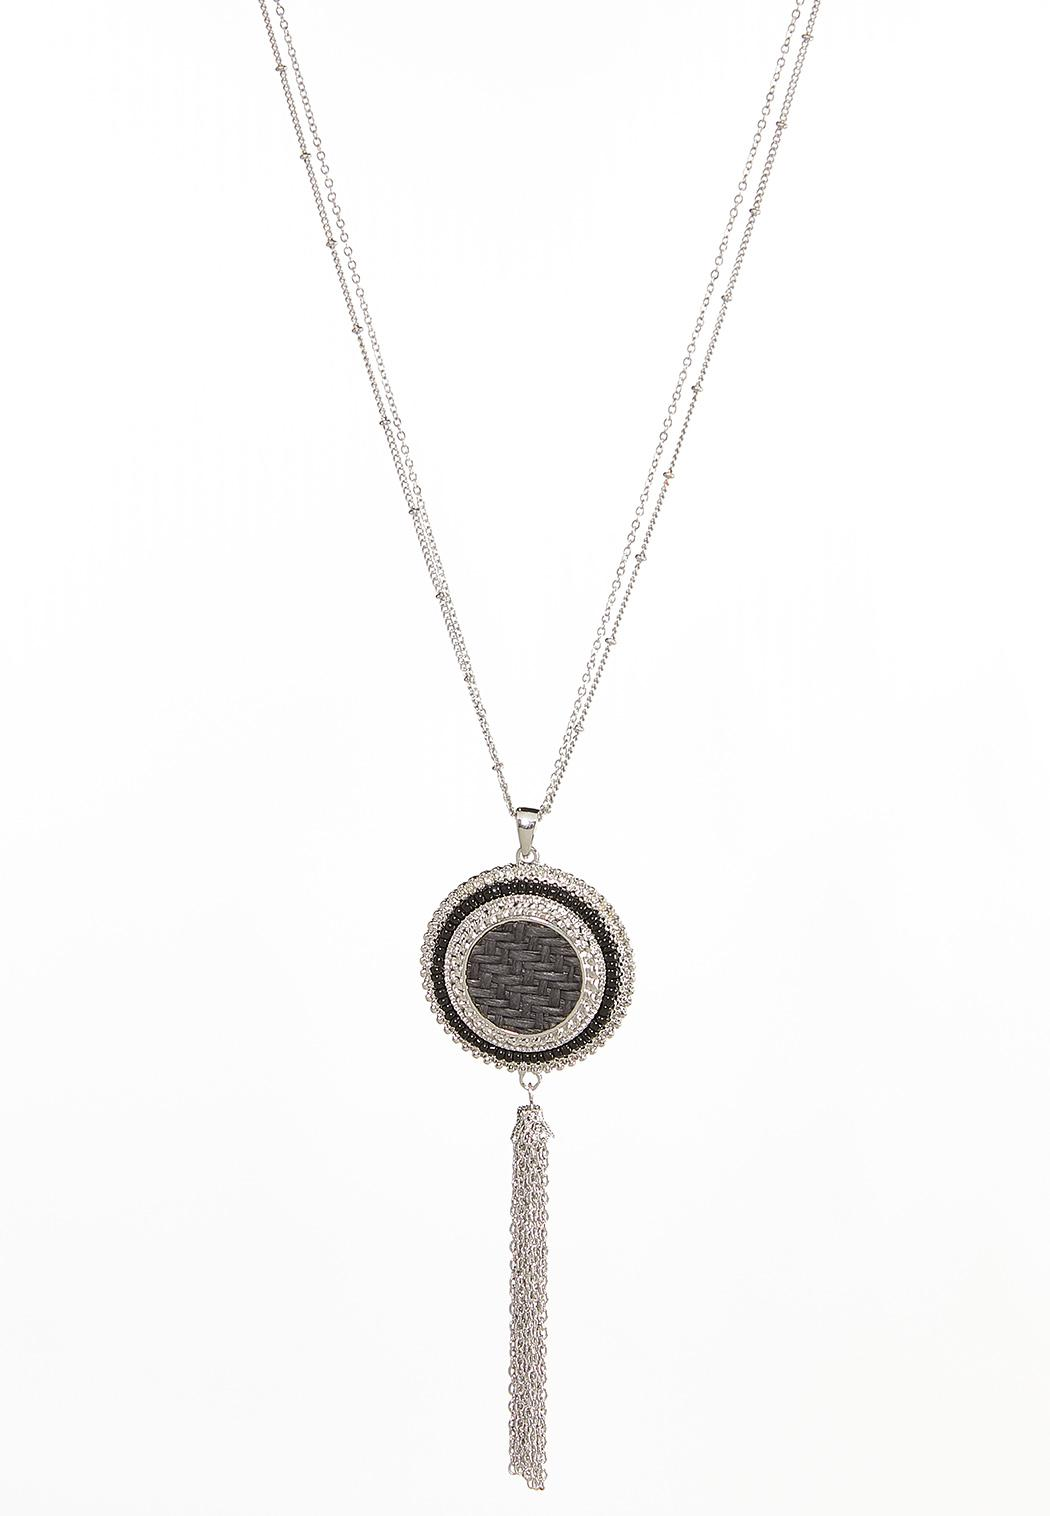 Double Chain Tasseled Pendant Necklace